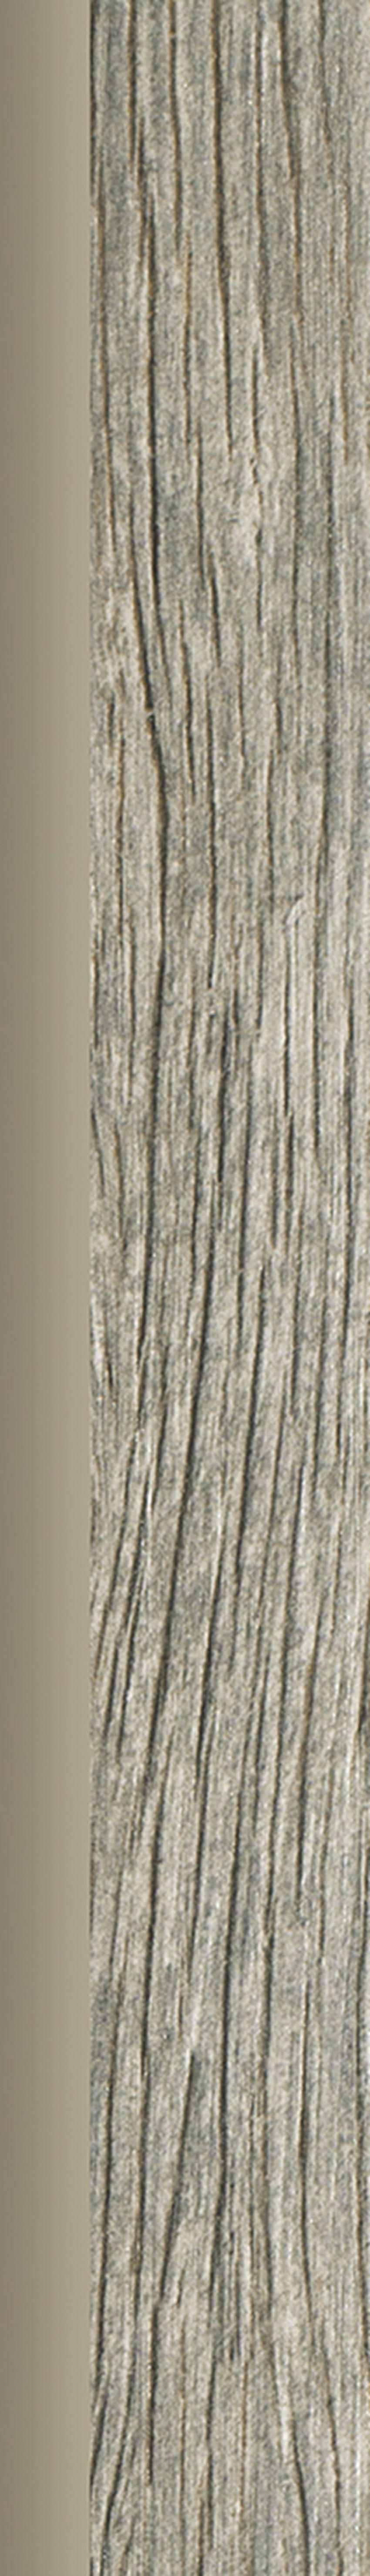 Płytka dekoracyjna 7,2x49,1 cm  Paradyż Balance Grys Cokół Mat